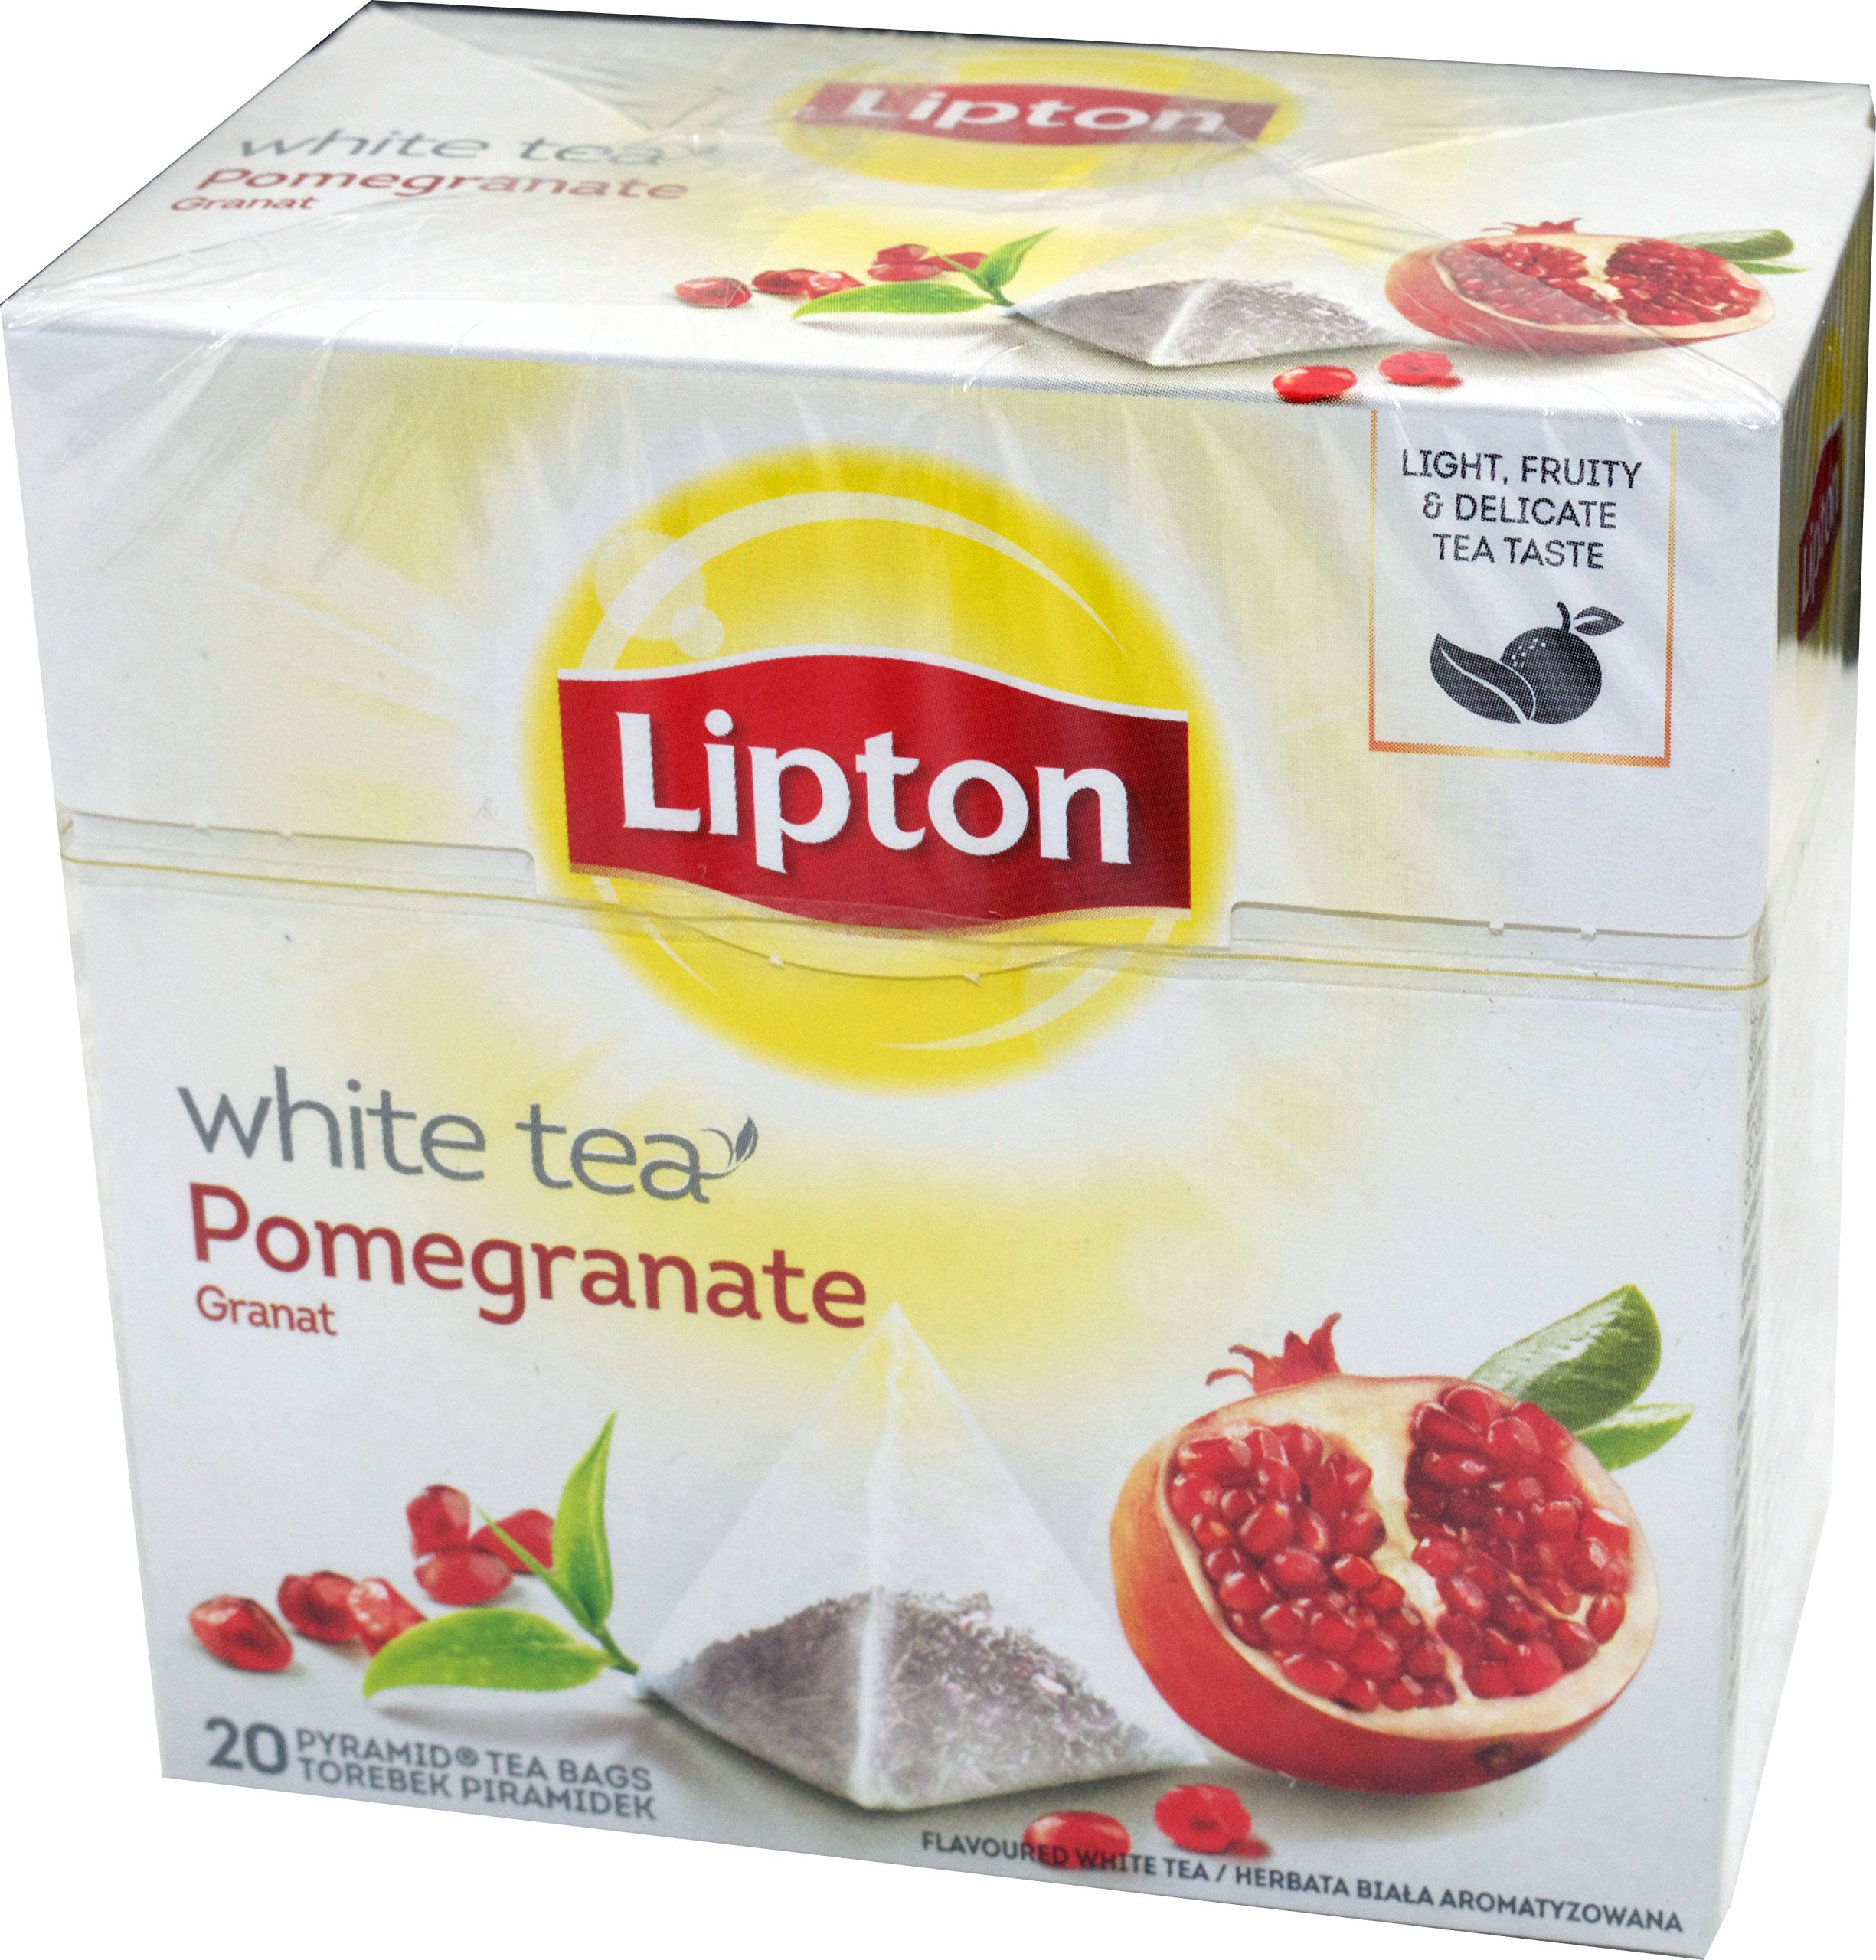 Lipton-Granatapfel-Tea-White-Aromatisiert-3-x-20-Pyramidenbeutel